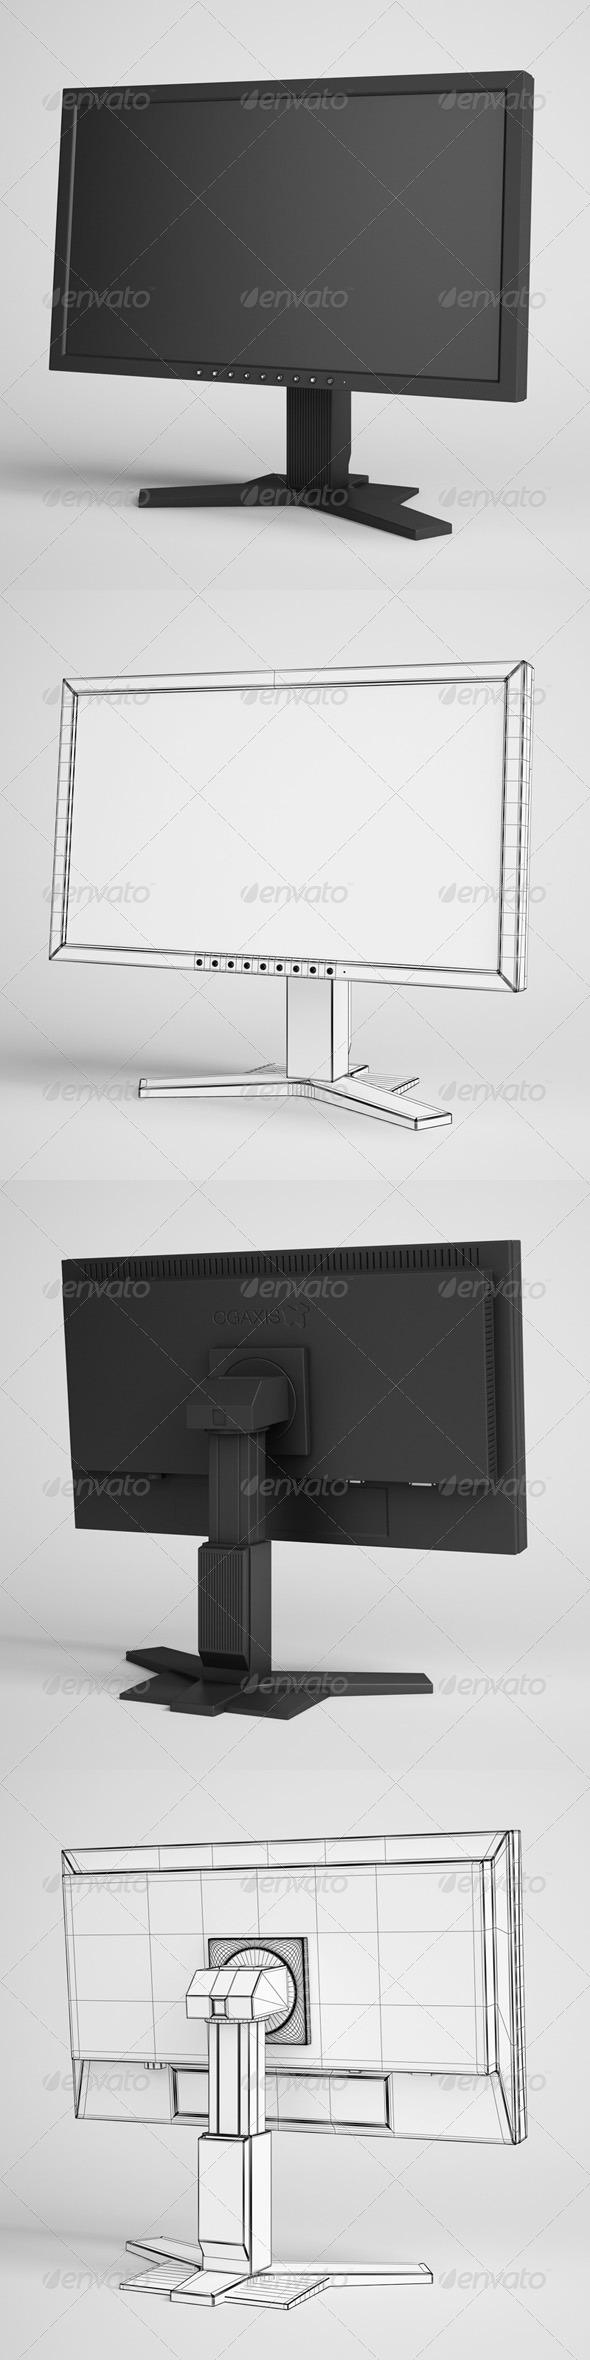 3DOcean CGAxis Flatscreen Monitor Electronics 20 3D Models -  Electronics 166336